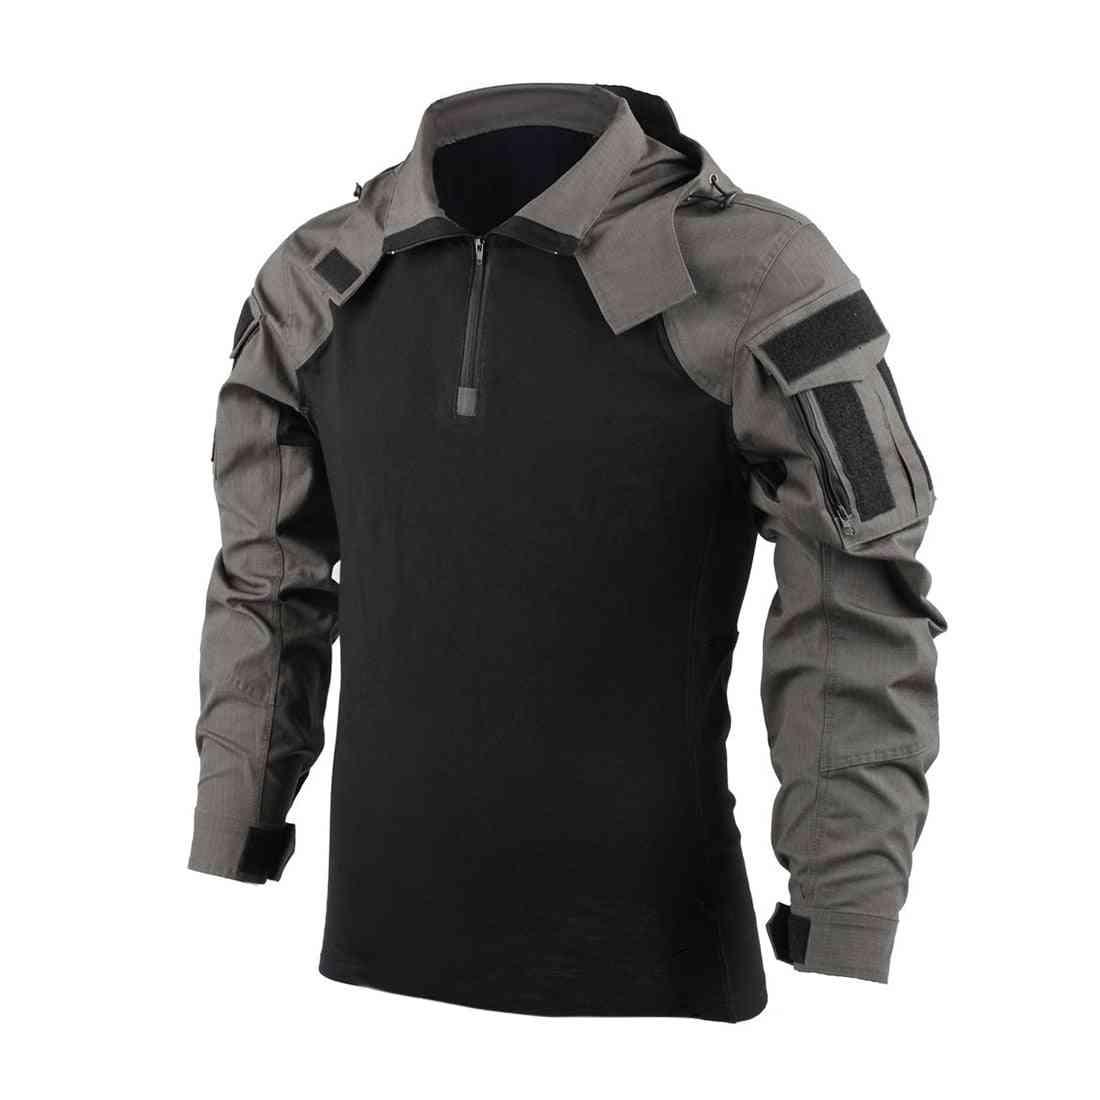 Tactical Hunting Shirt- Combat Uniform, Equipment Storage